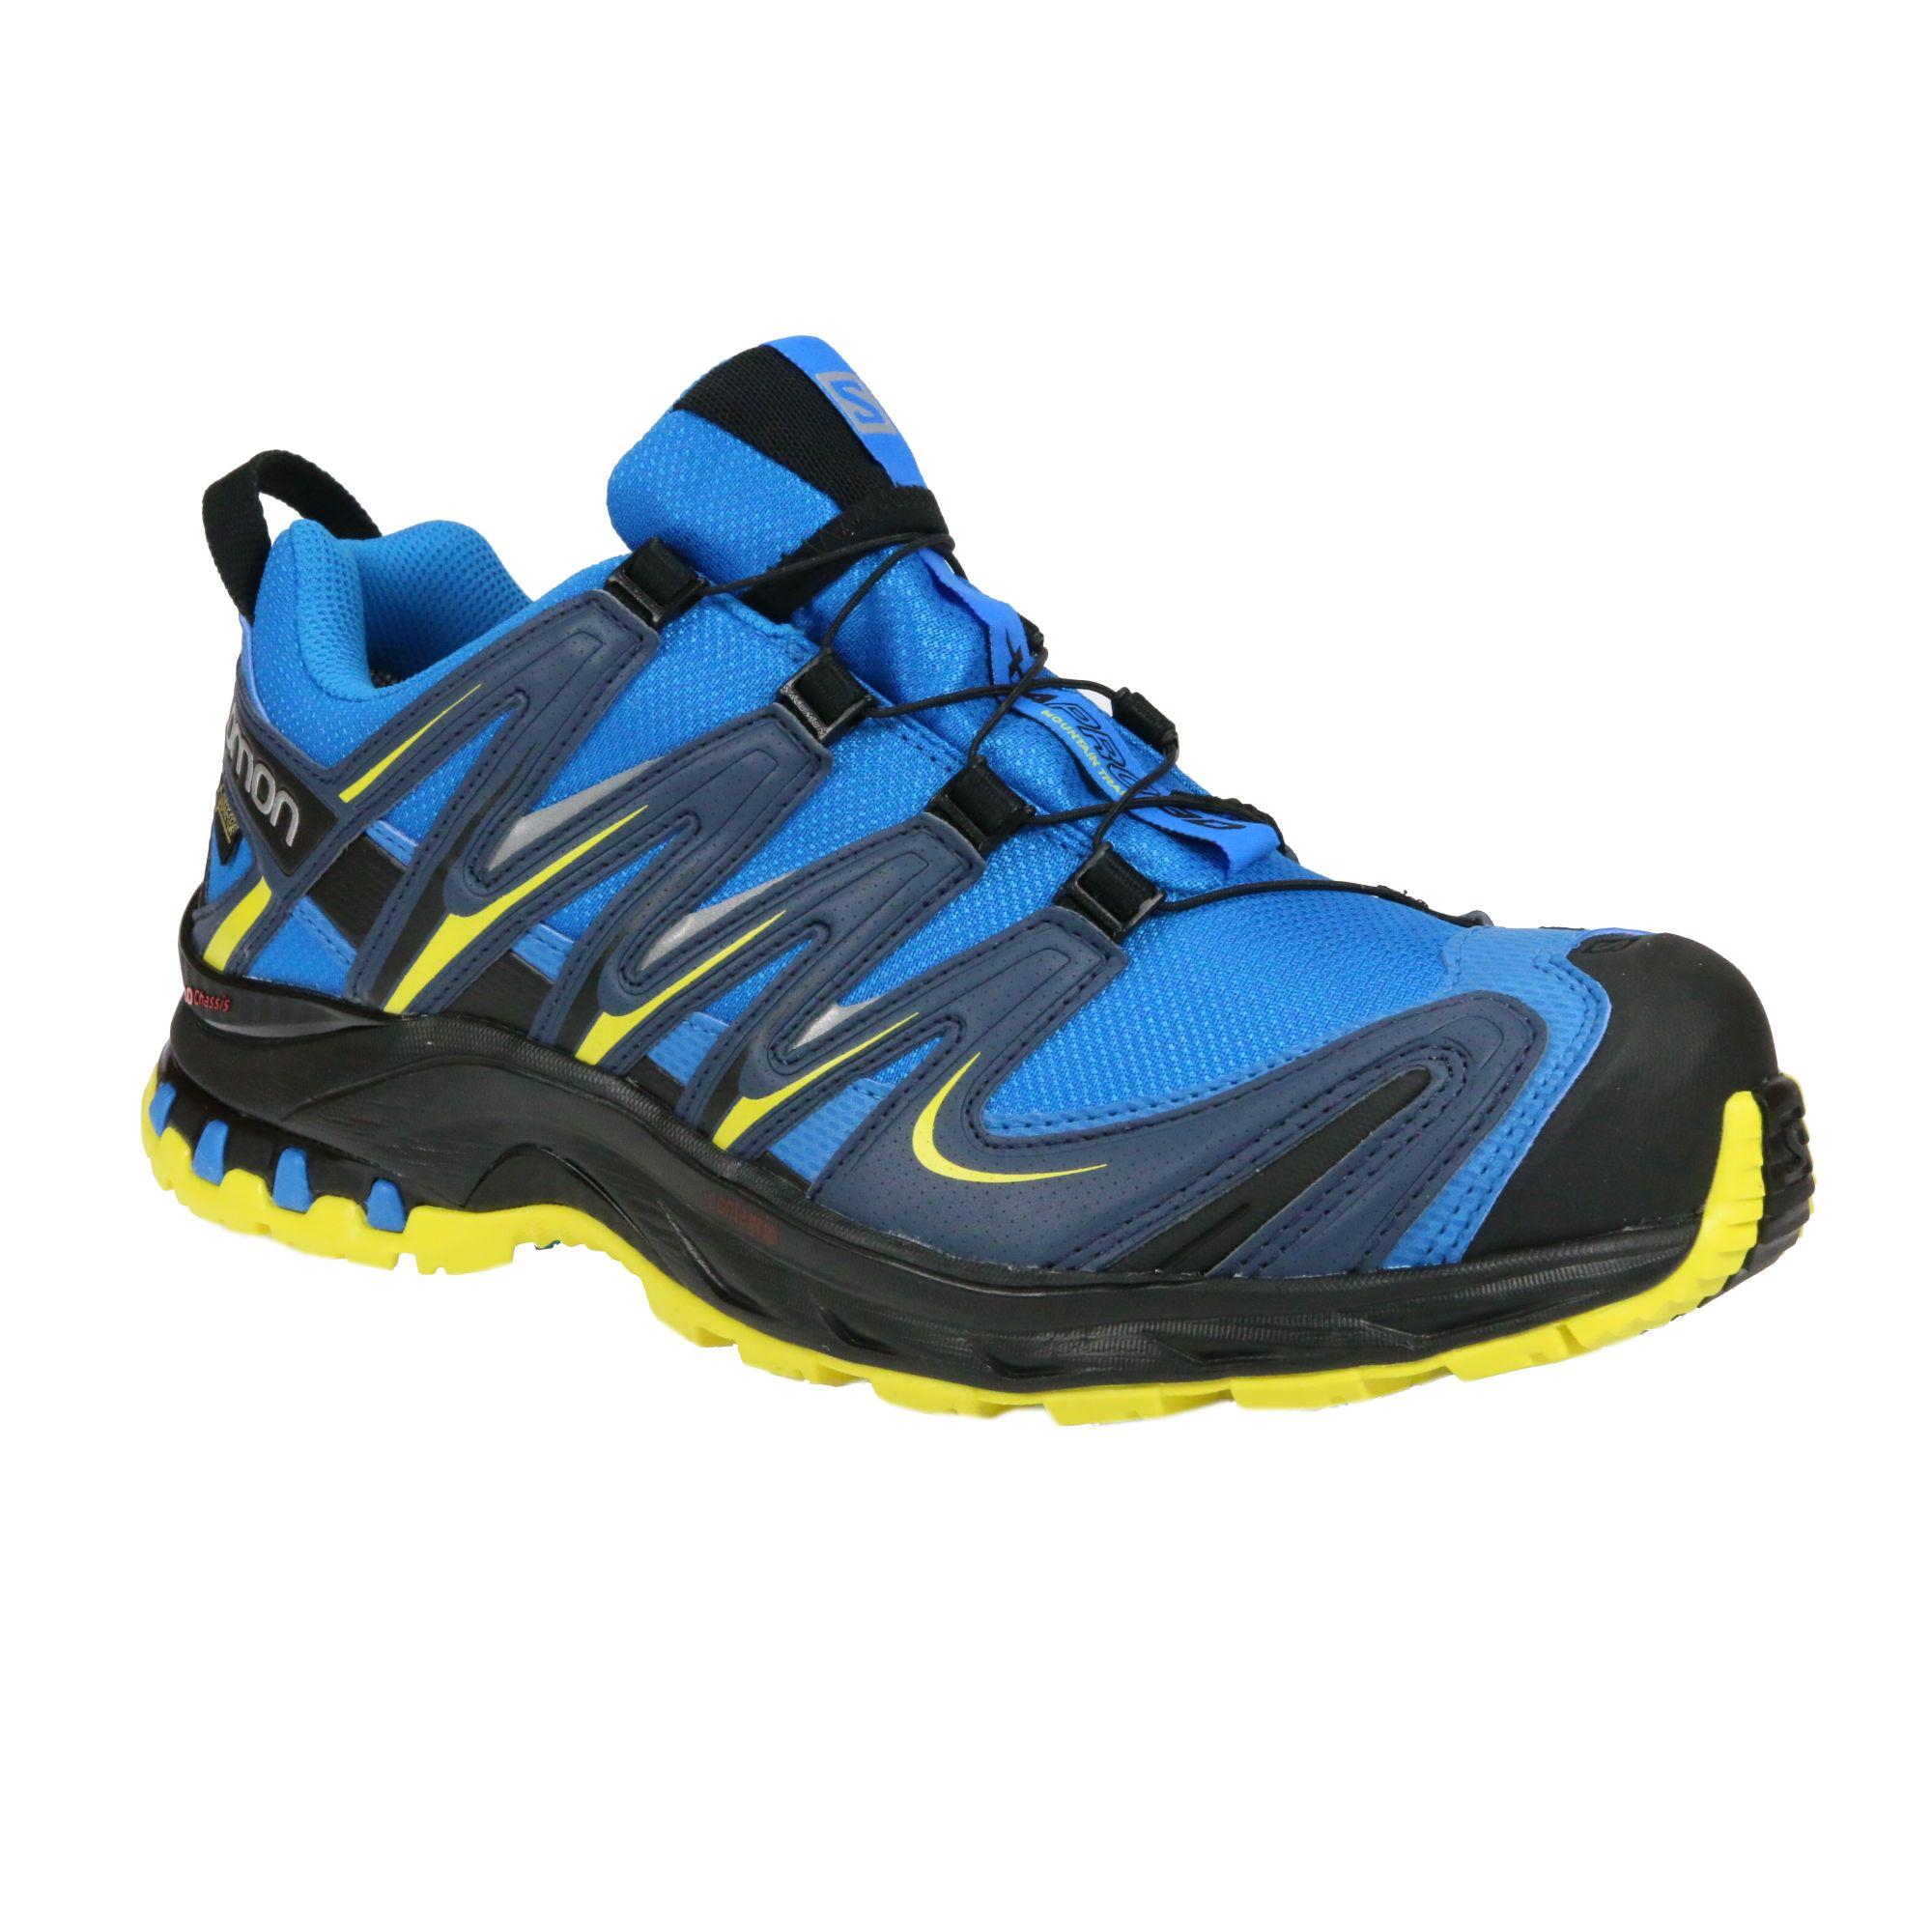 Salomon Gore Tex Trail Running Shoes